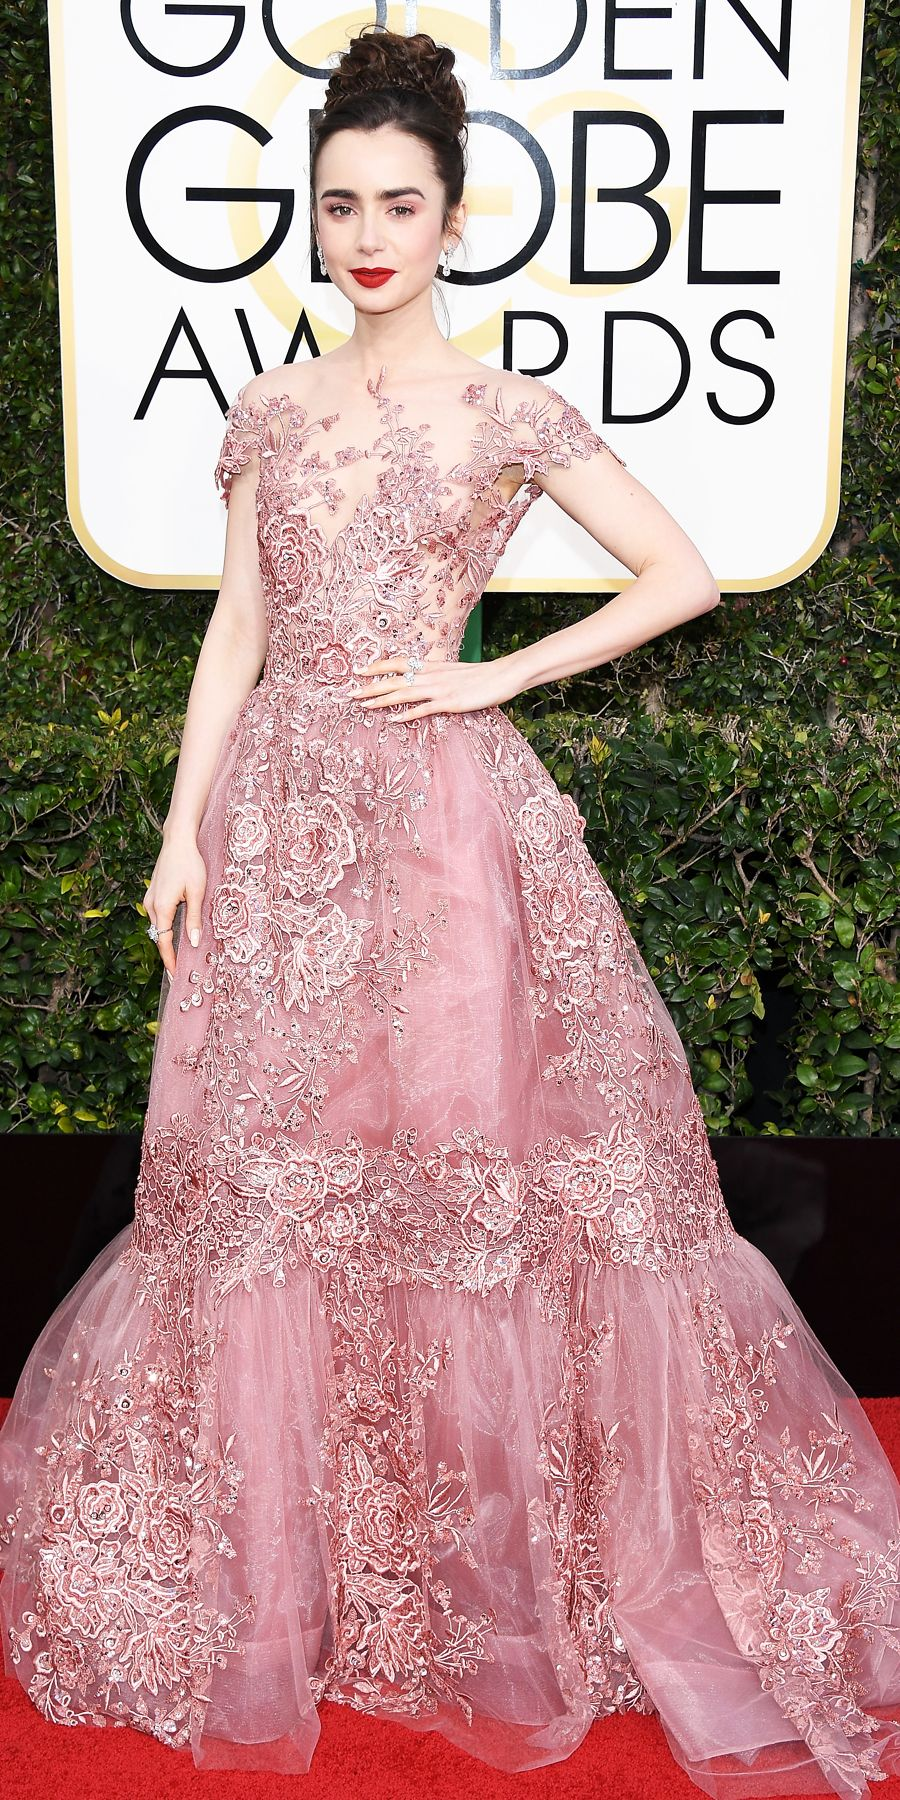 All the Glamorous 2017 Golden Globes Red Carpet Arrivals | ROBES DE ...